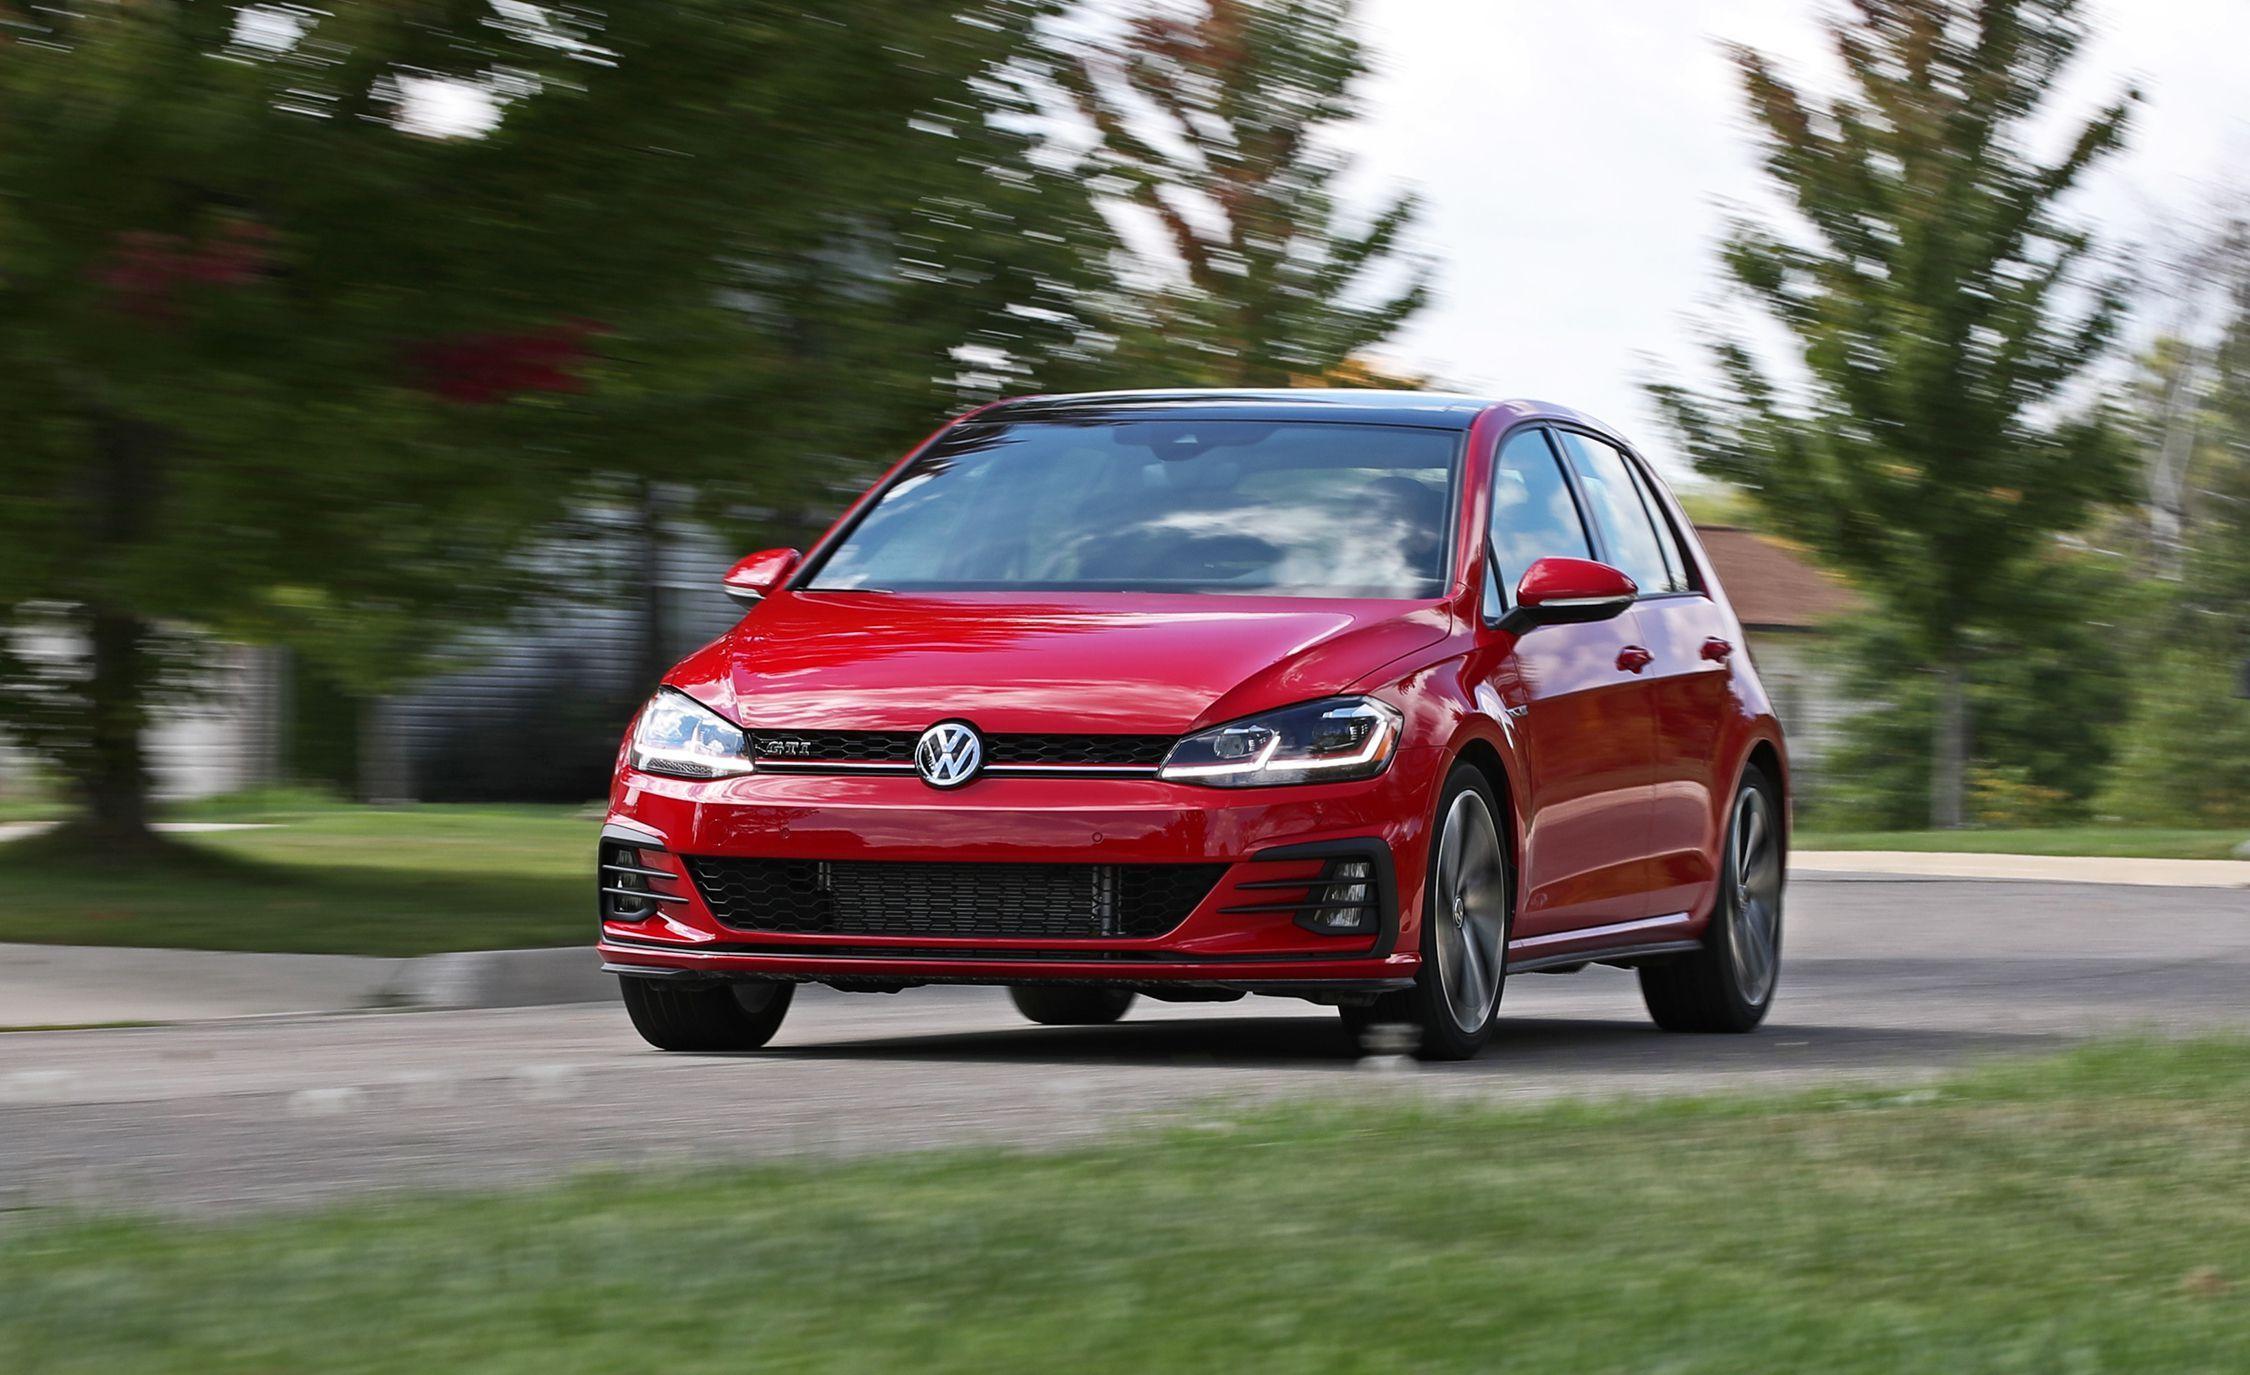 2019 Volkswagen Golf Gti Reviews Volkswagen Golf Gti Price Photos